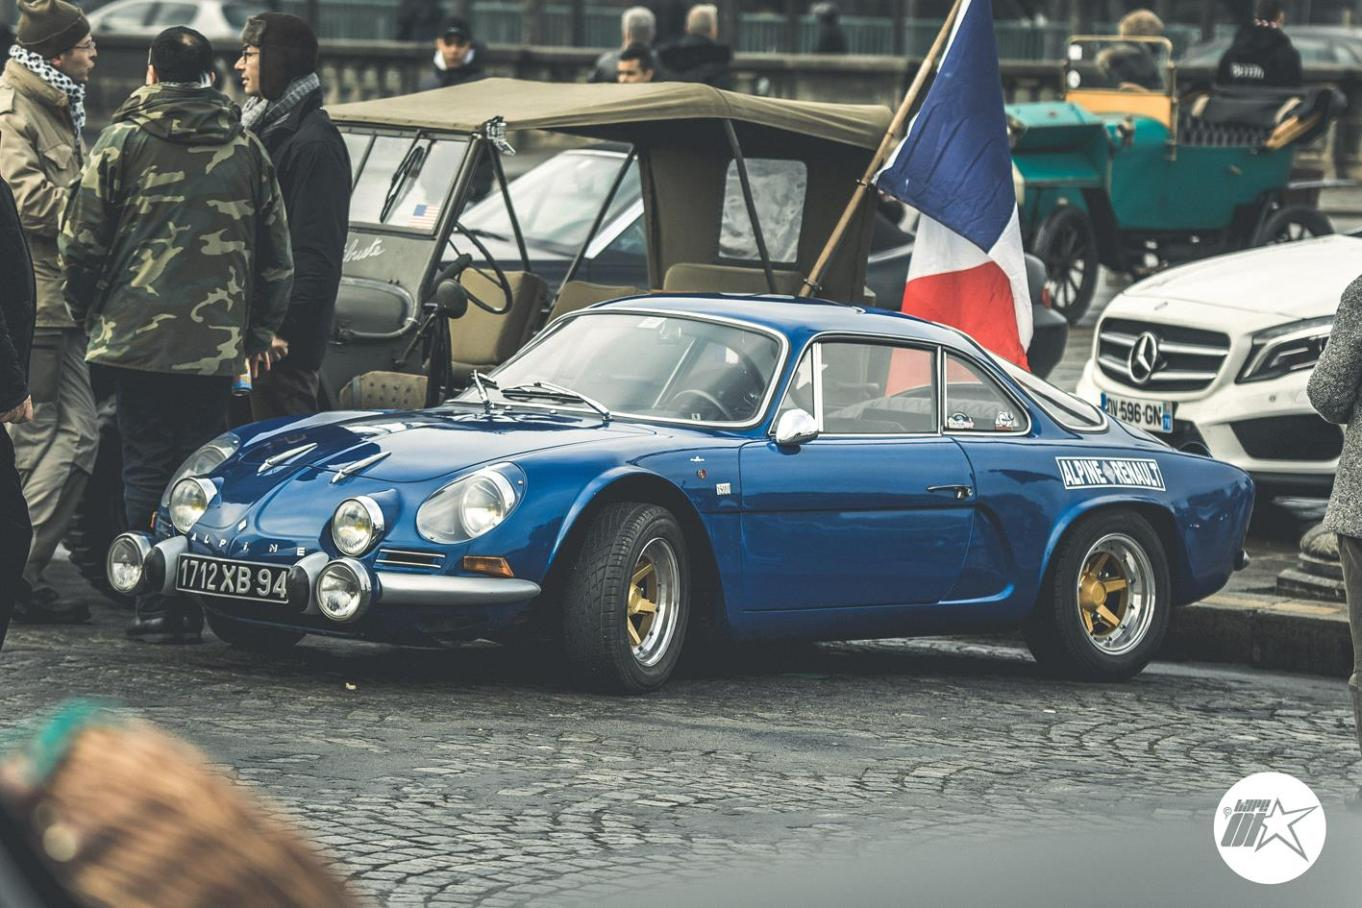 Alpine A106 A110 GTA Traversée Paris Type-01 - 6